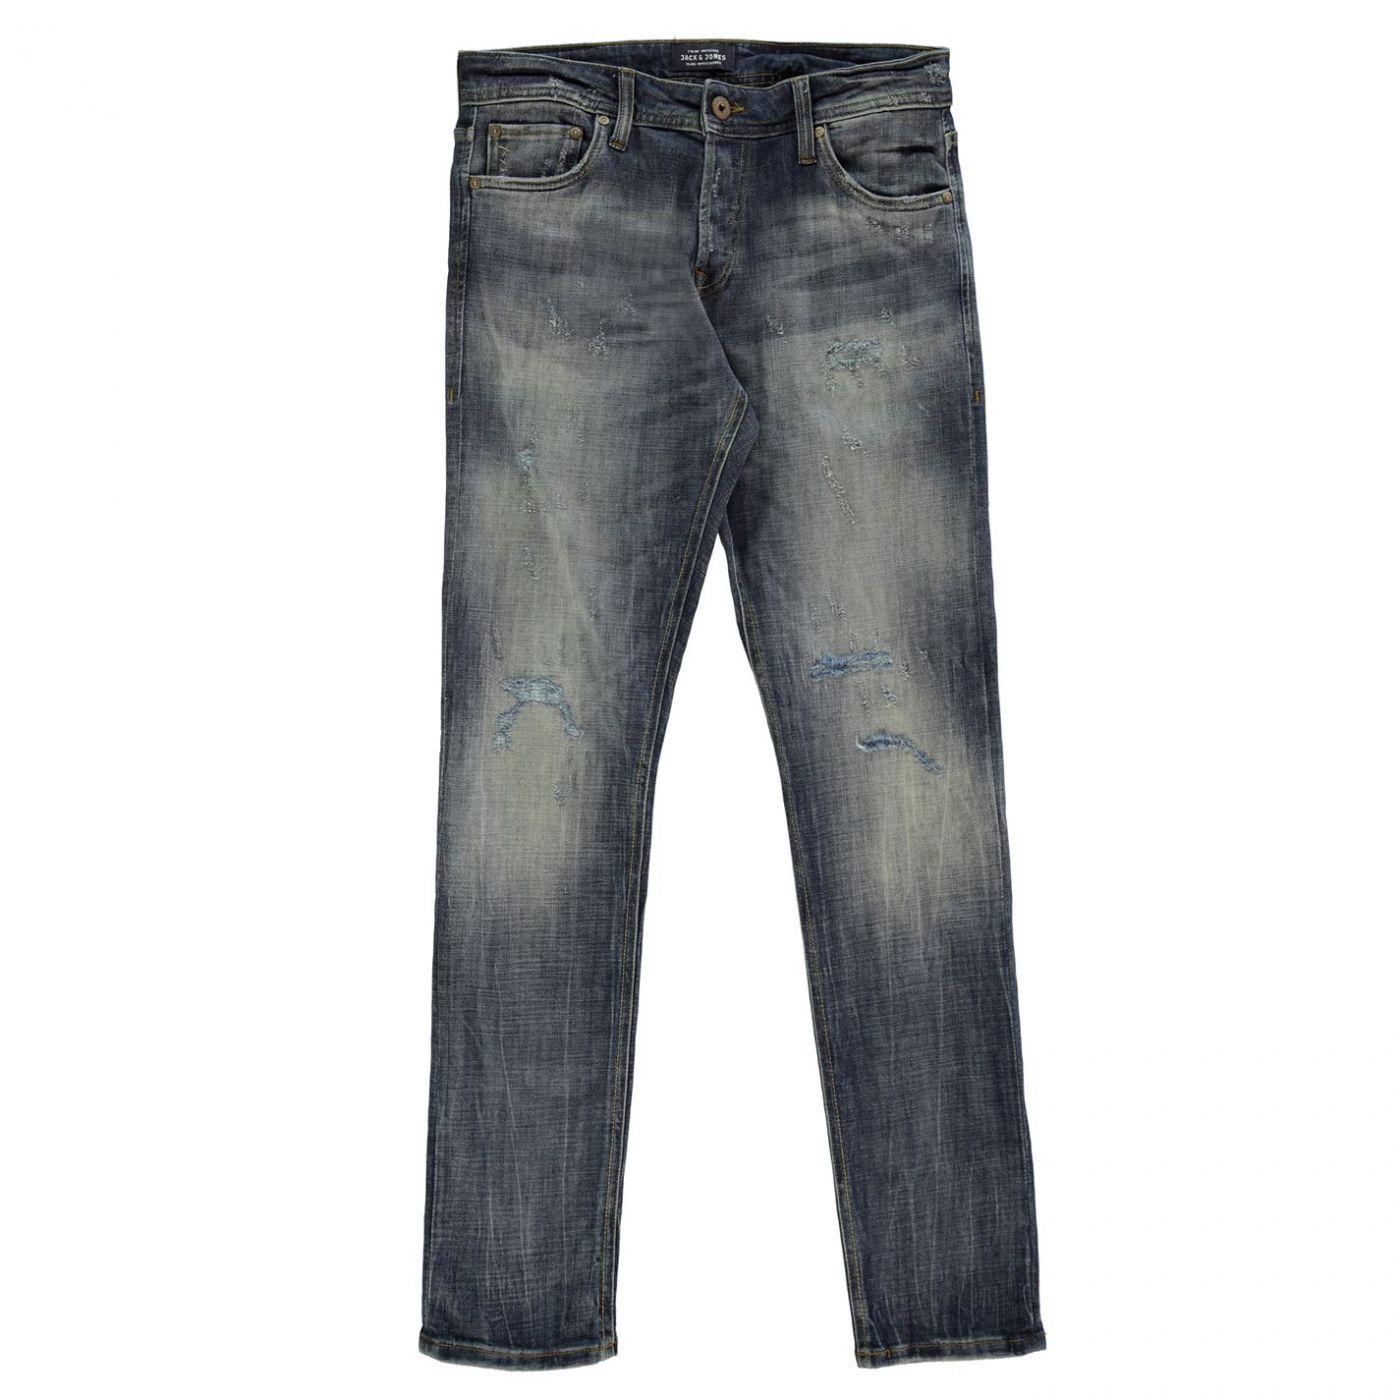 Disney Original Glenn Jeans Mens